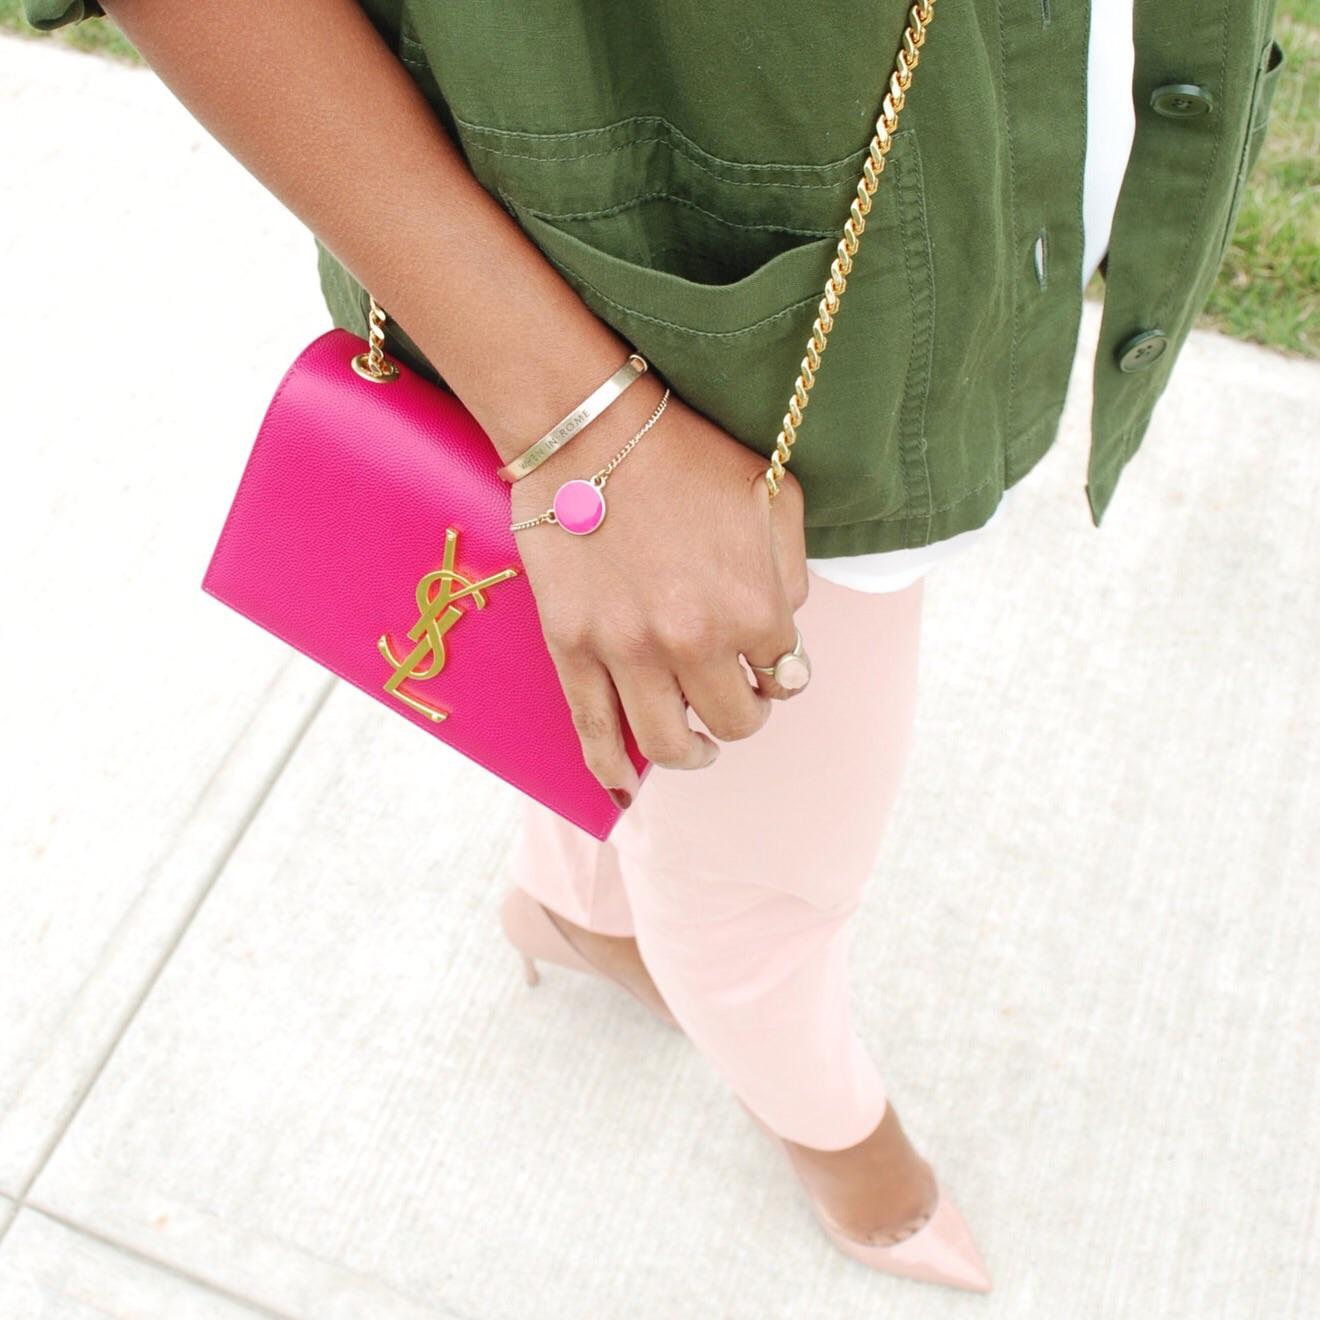 ysl pink handbag